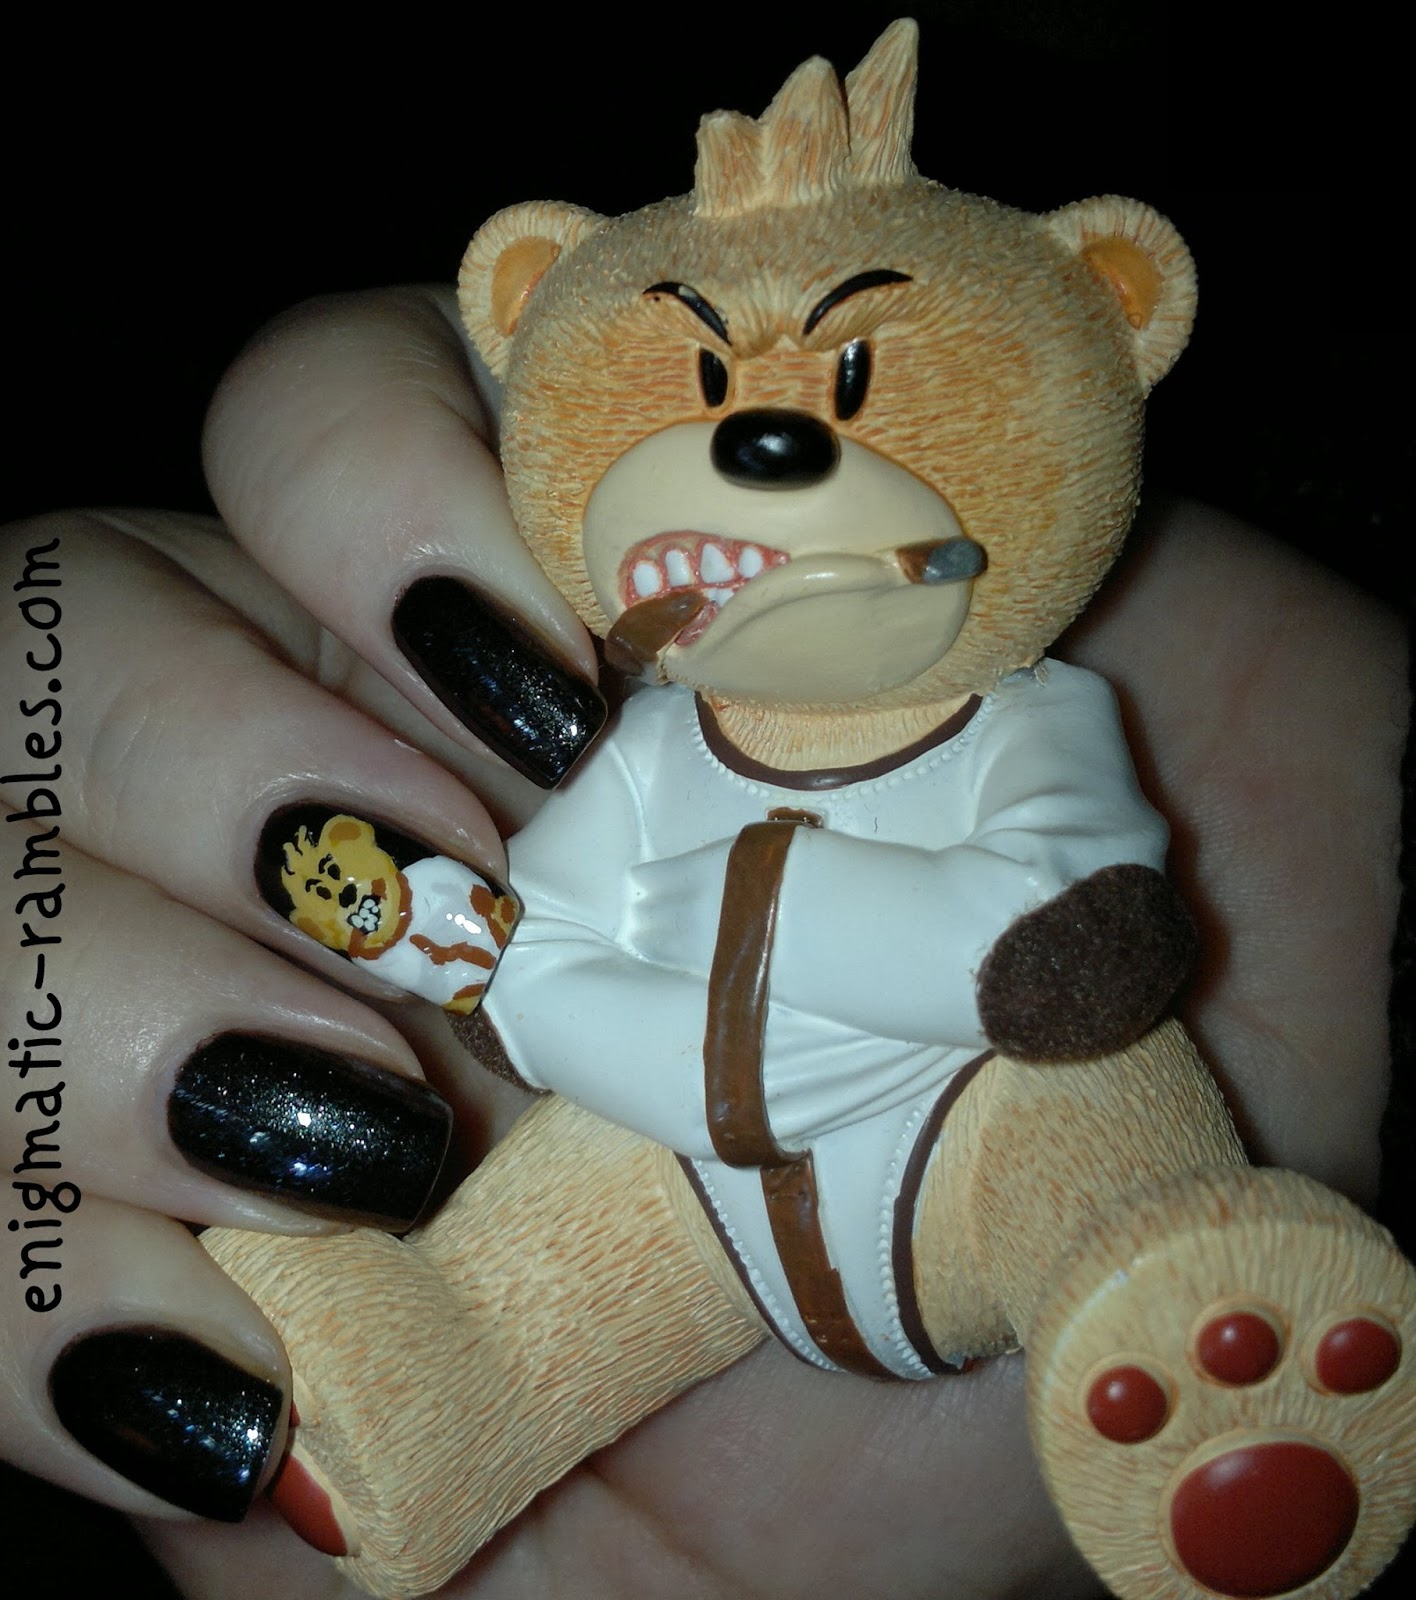 Bad-Taste-Bears-BTB-Psycho-Nail-Art-Nails-Freehand